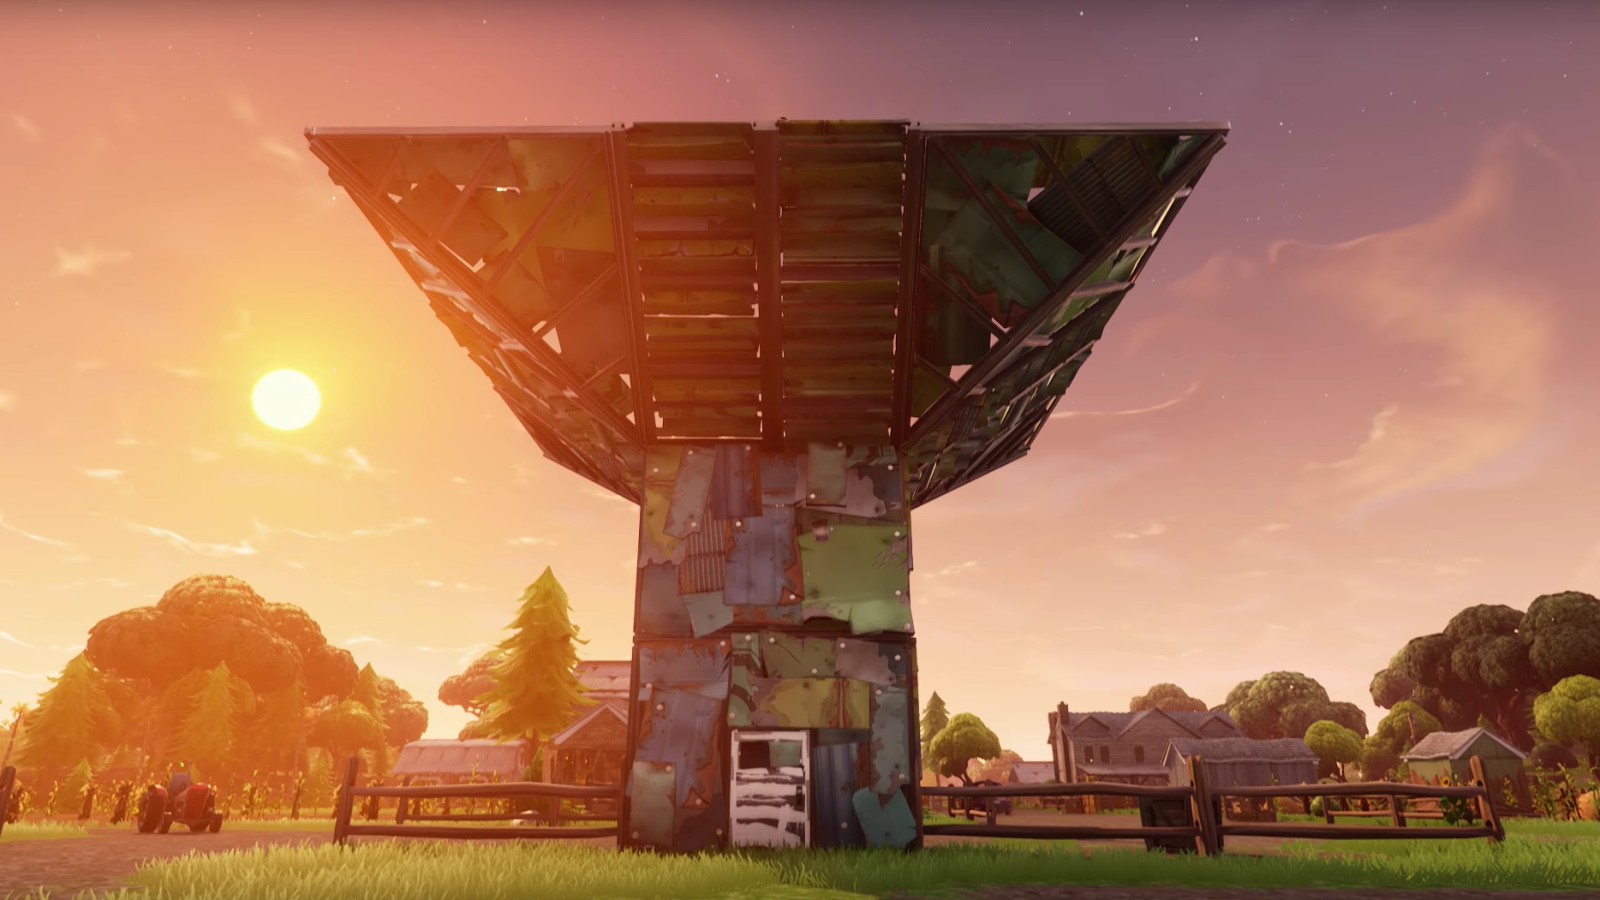 KotakuFortnite Players Are Using The New PortAFort For